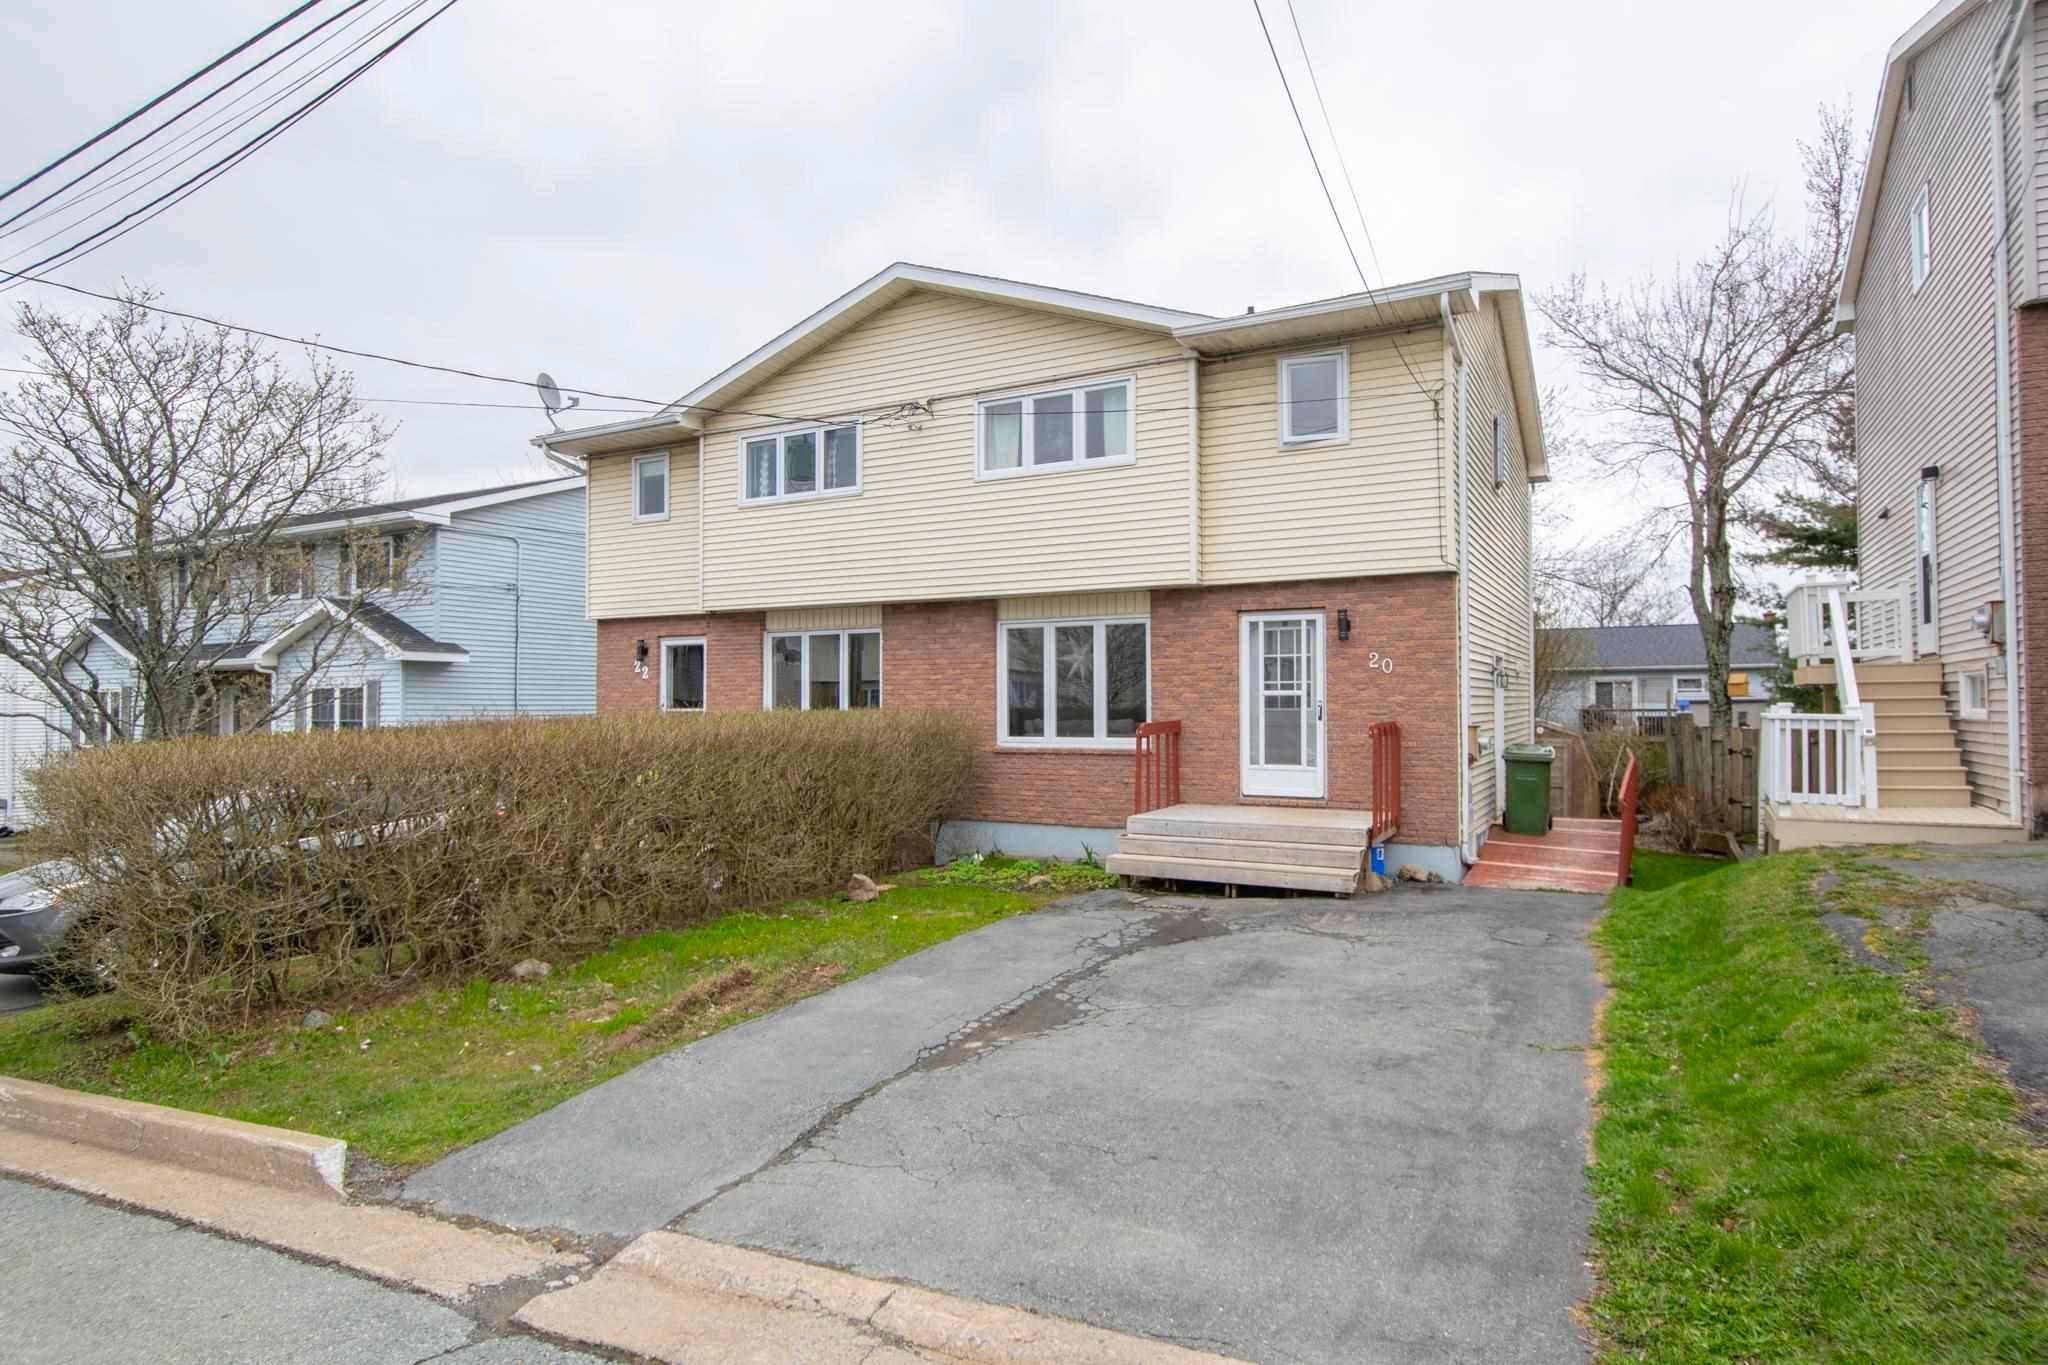 Main Photo: 20 Oakwood Court in Dartmouth: 17-Woodlawn, Portland Estates, Nantucket Residential for sale (Halifax-Dartmouth)  : MLS®# 202110319